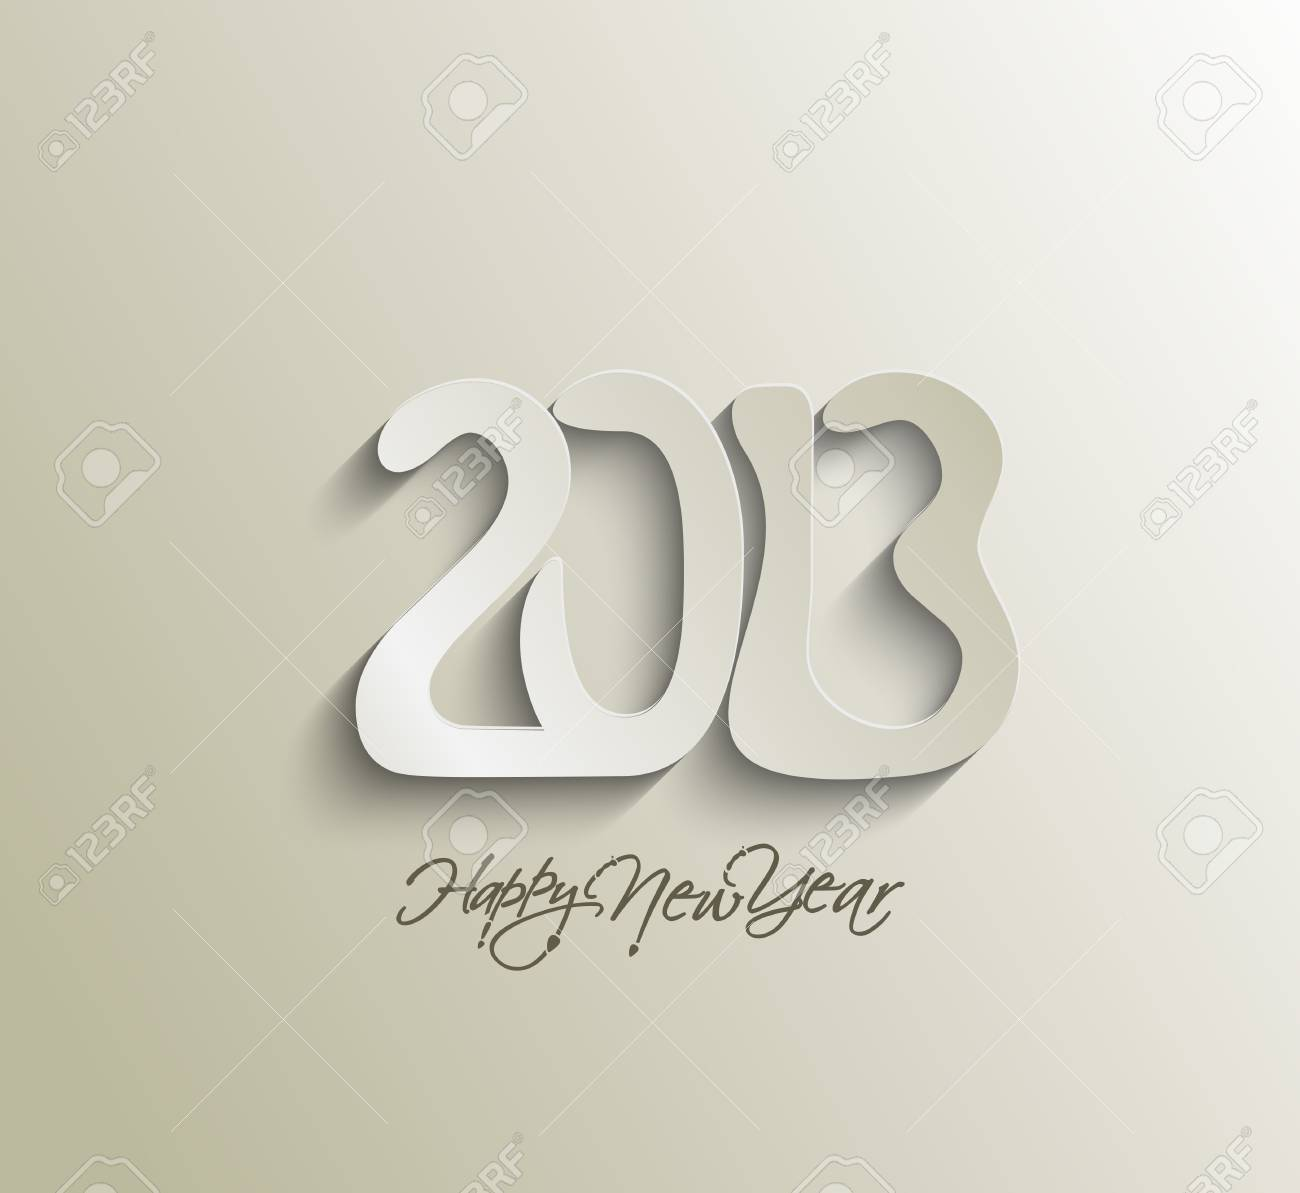 Happy new year 2013 celebration design. Stock Vector - 16818503